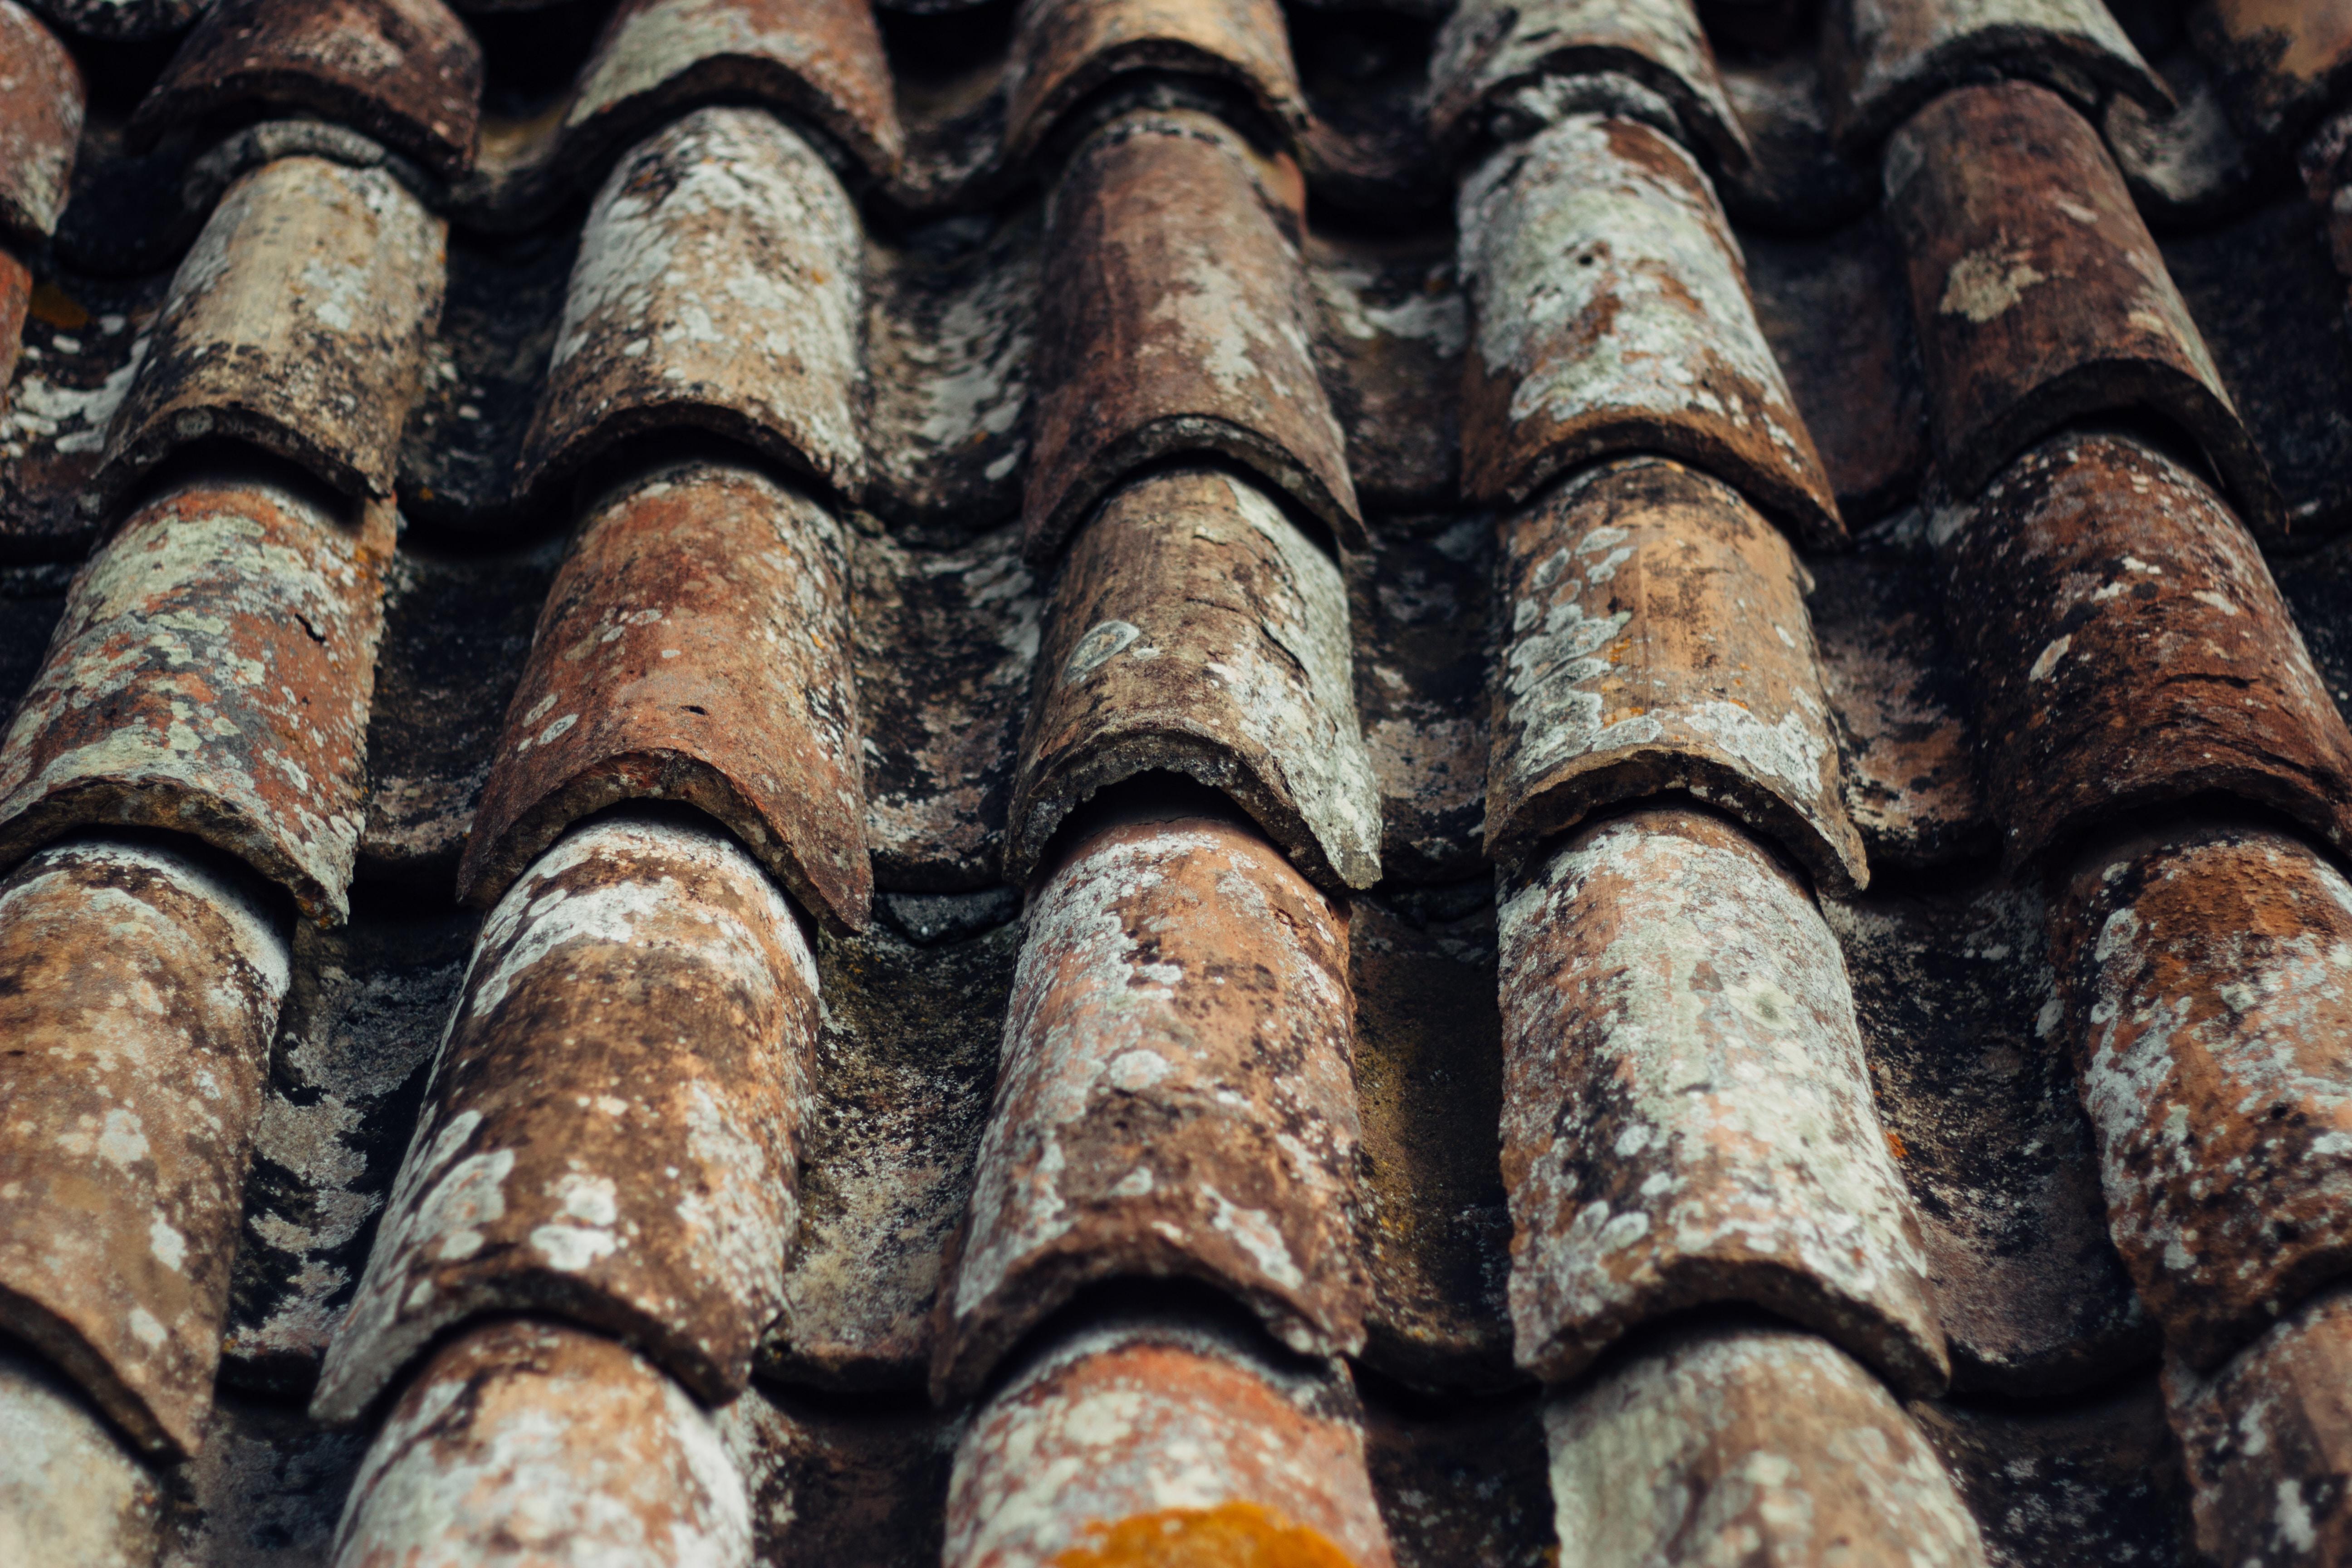 closeup photo of brown roof shingles